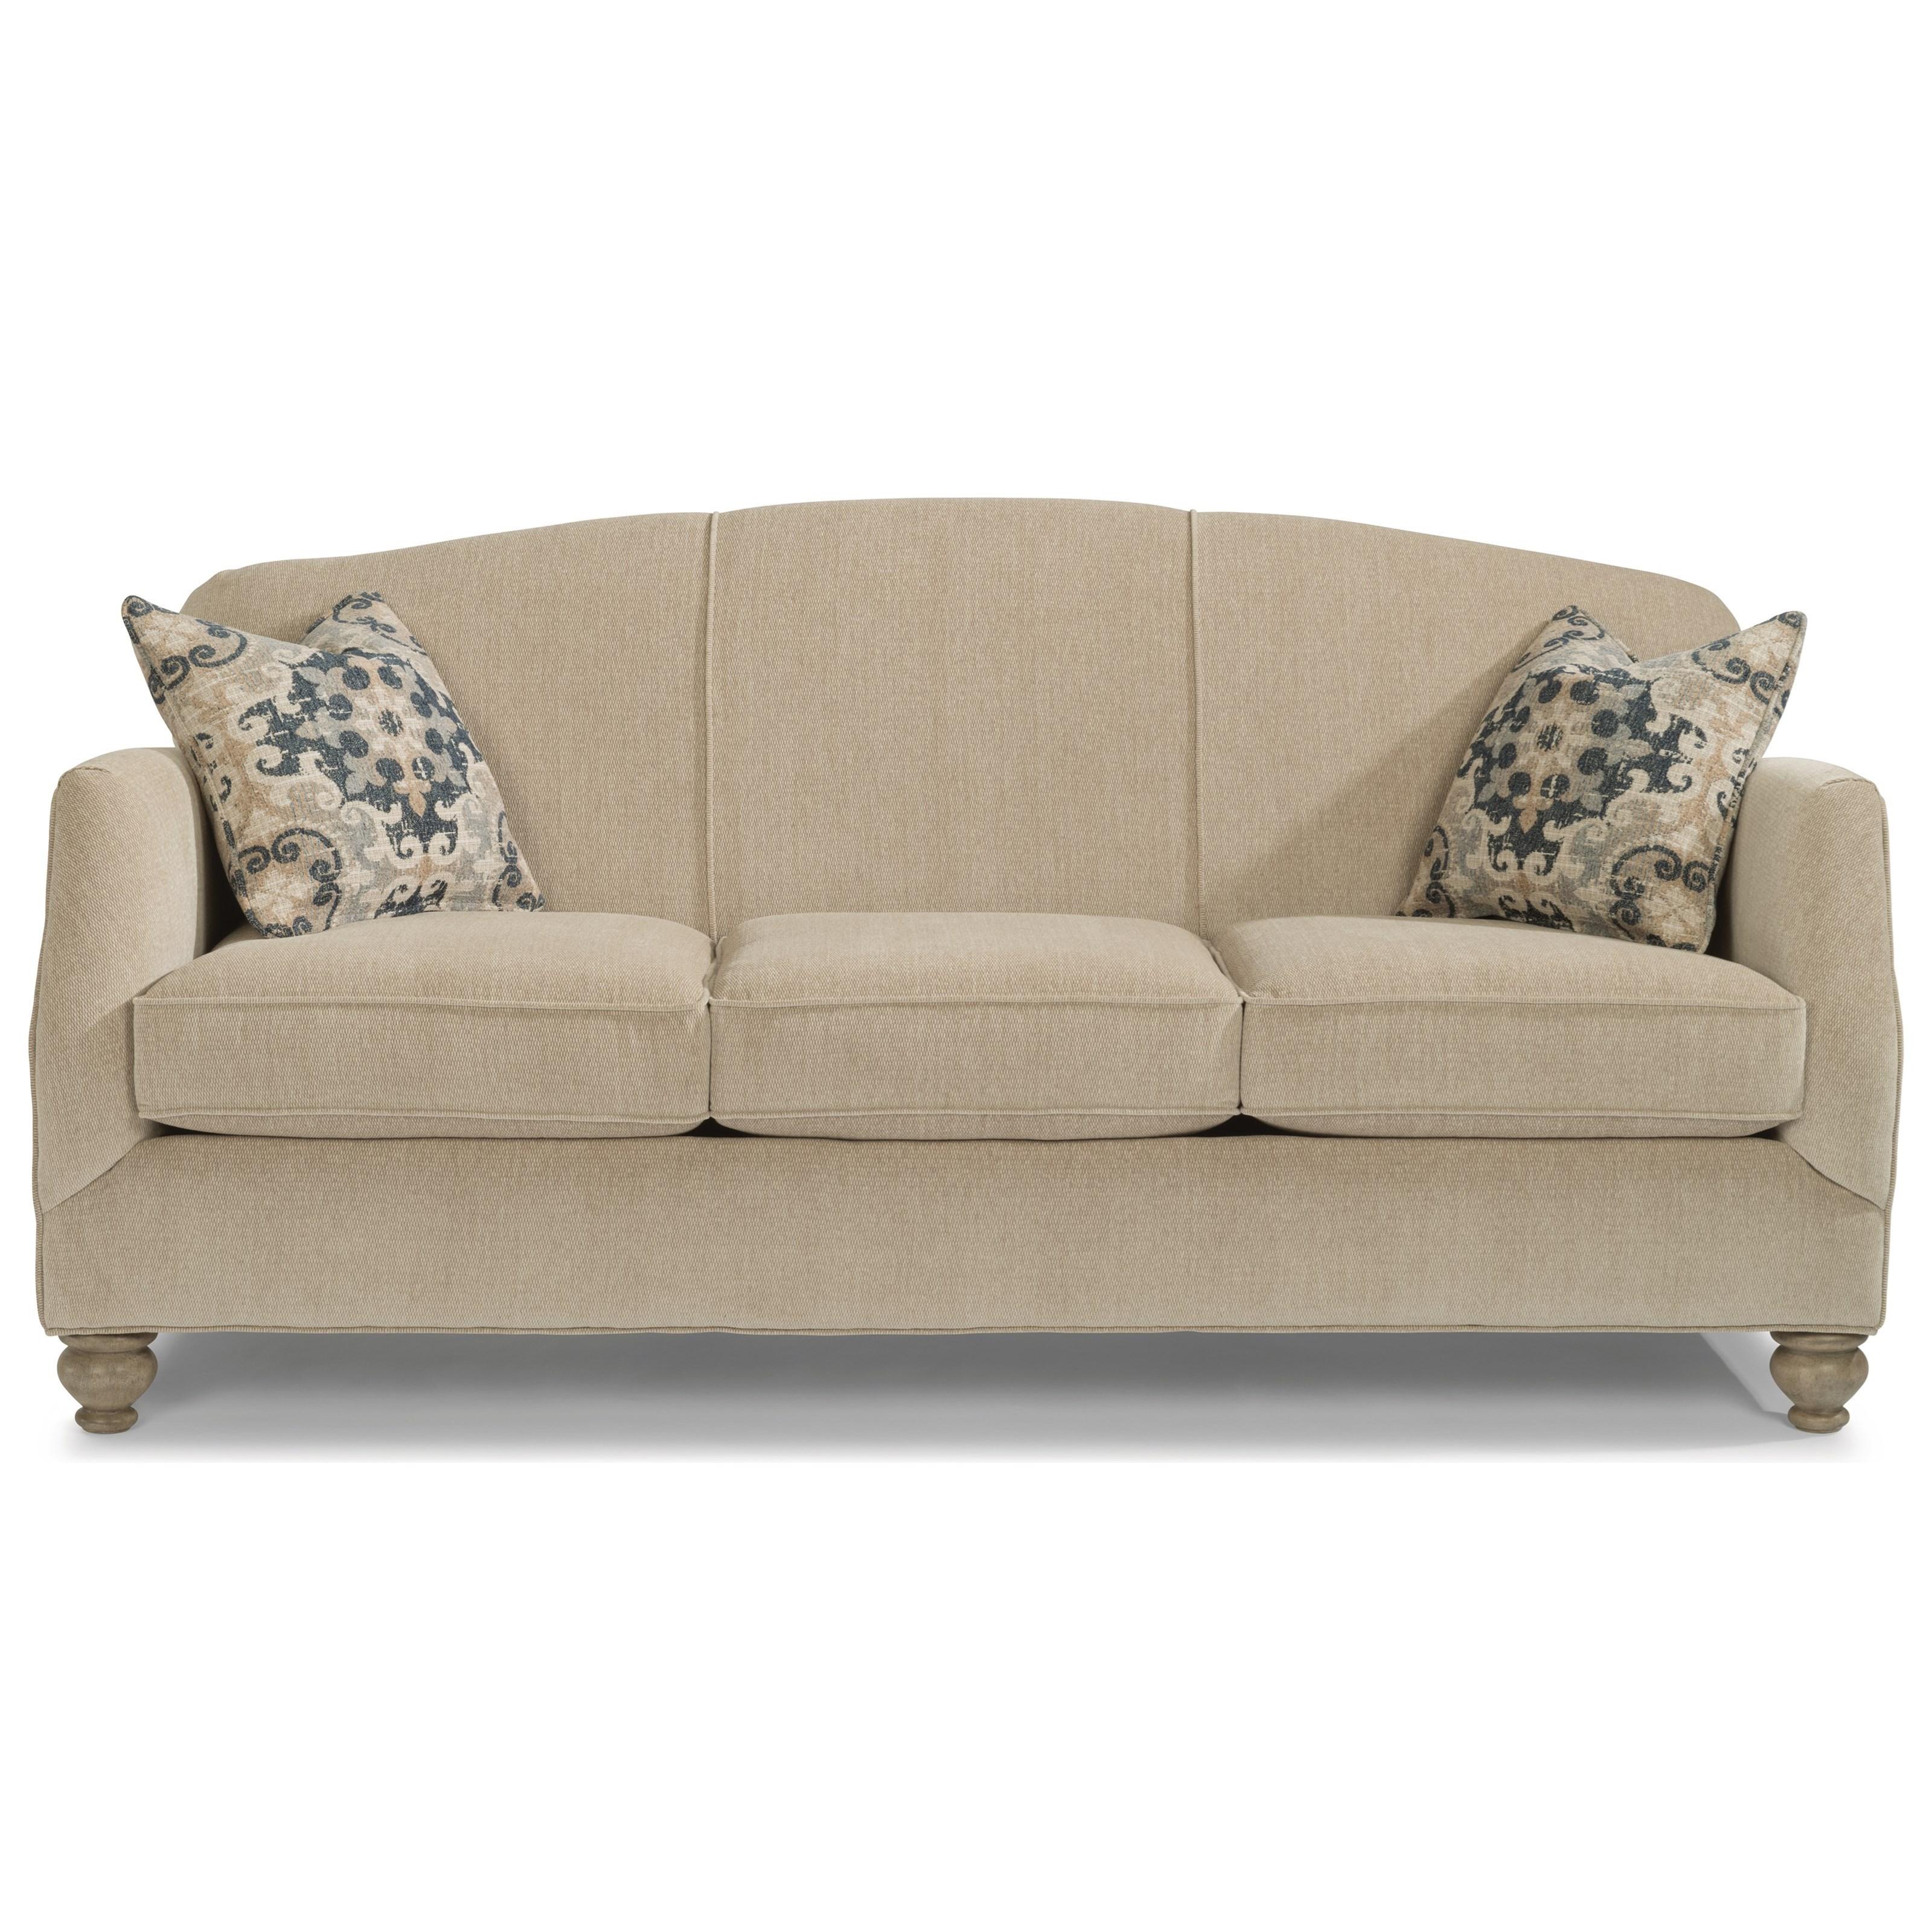 Flexsteel Plymouth 5362 31 Transitional Sofa With Bun Feet